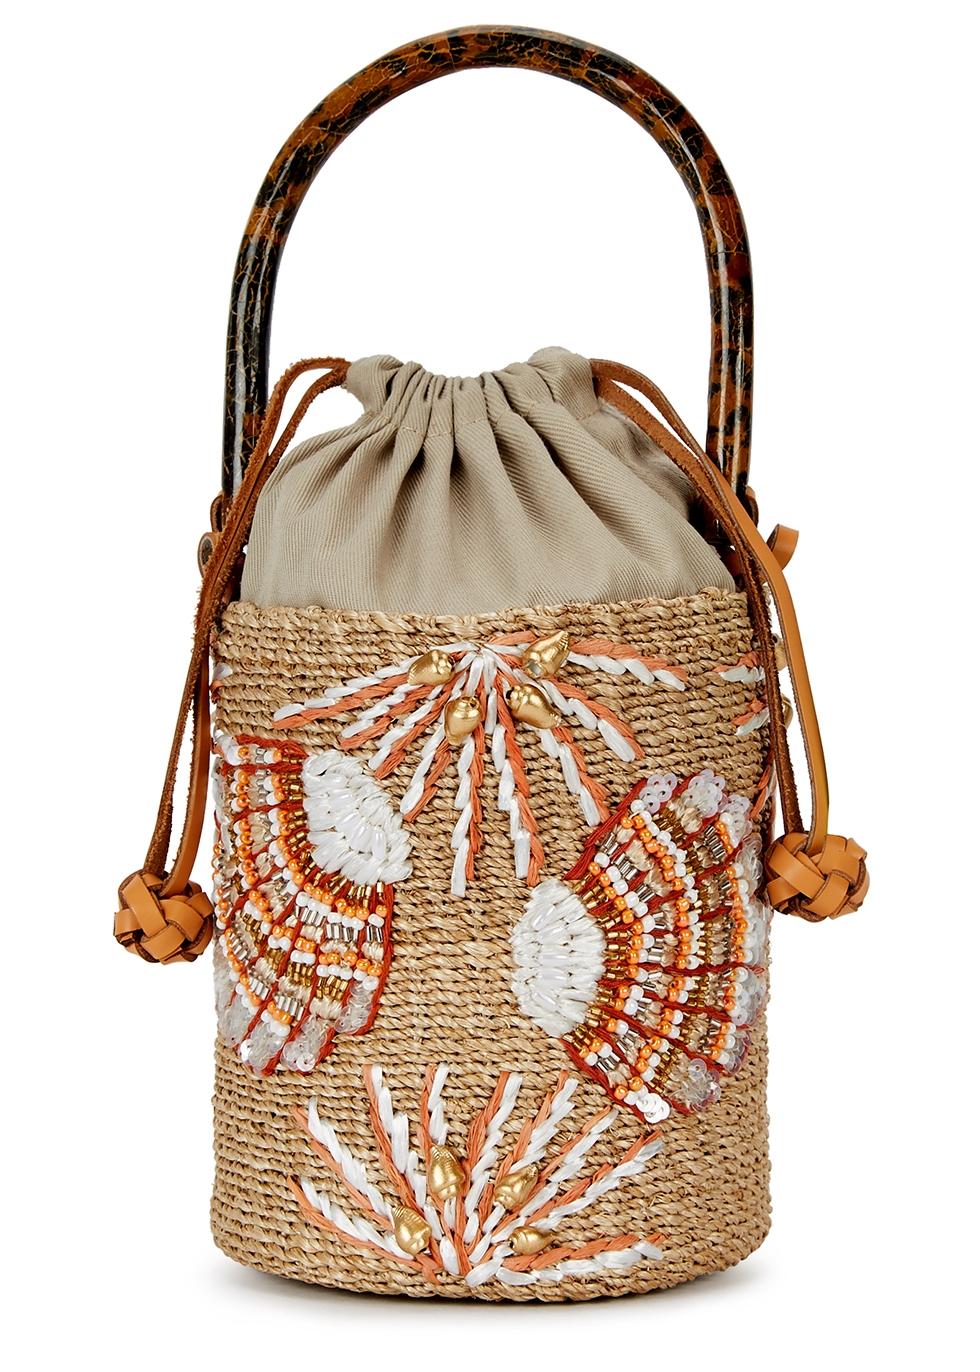 7c45f99cd167 Women's Designer Bags, Handbags and Purses - Harvey Nichols